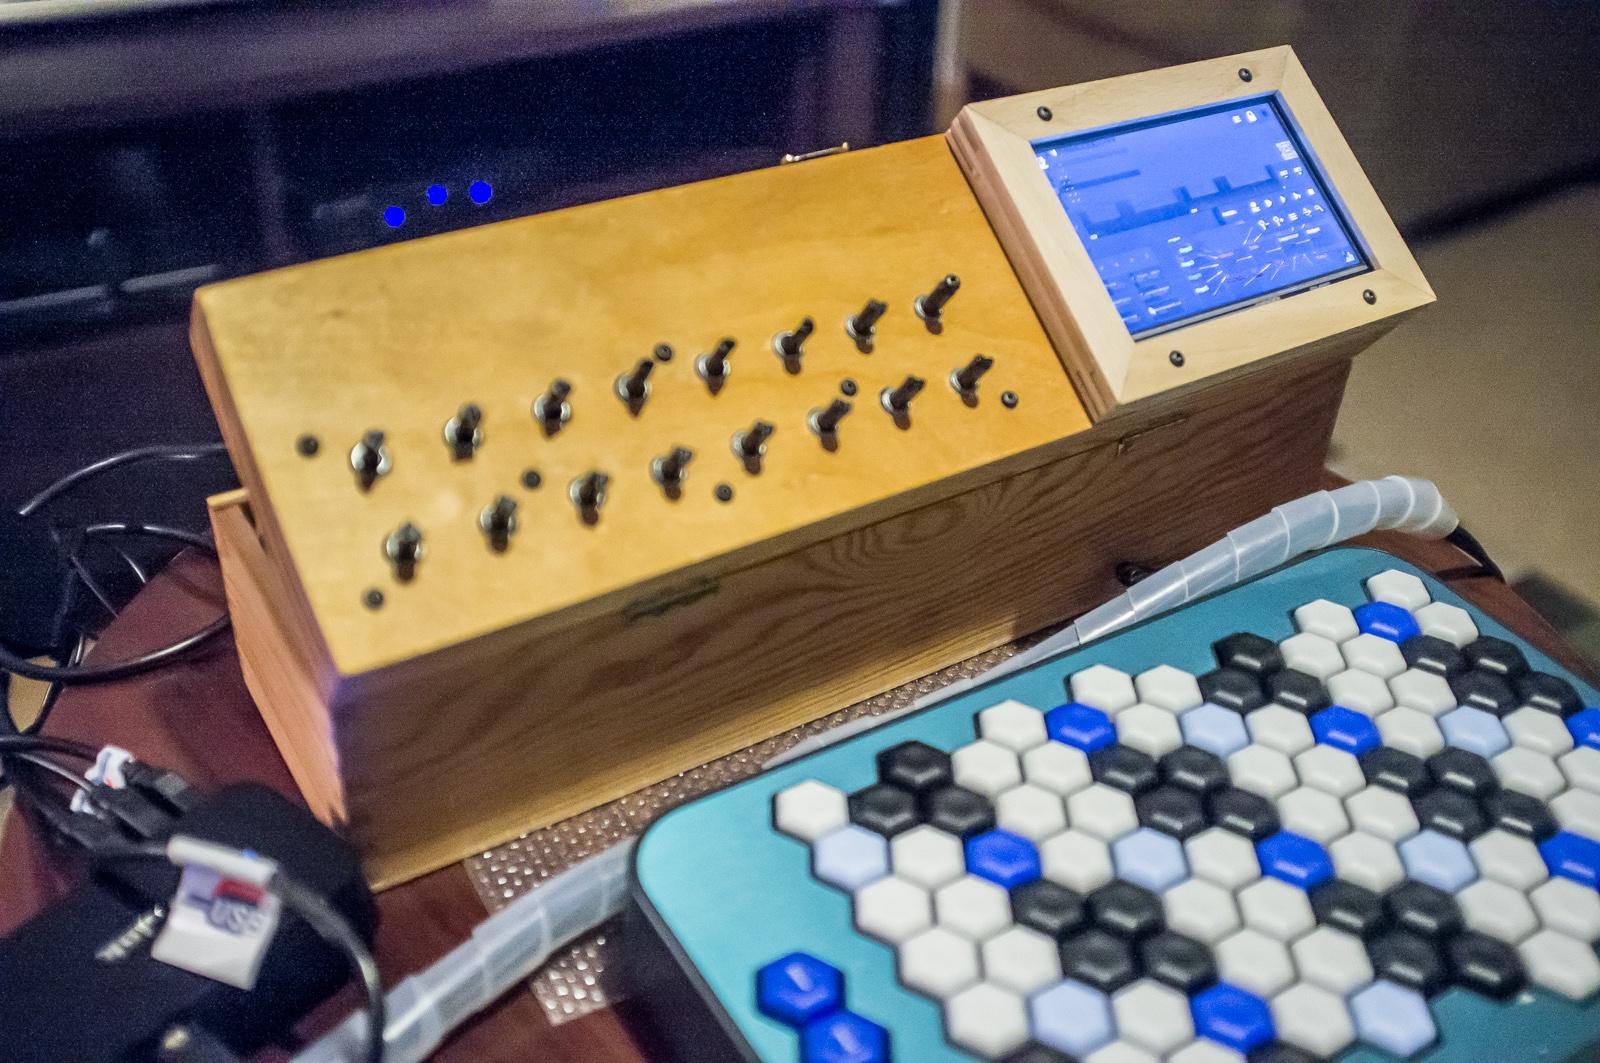 SunVox powered Raspberry Pi 2 synthesizer - WarmPlace ru